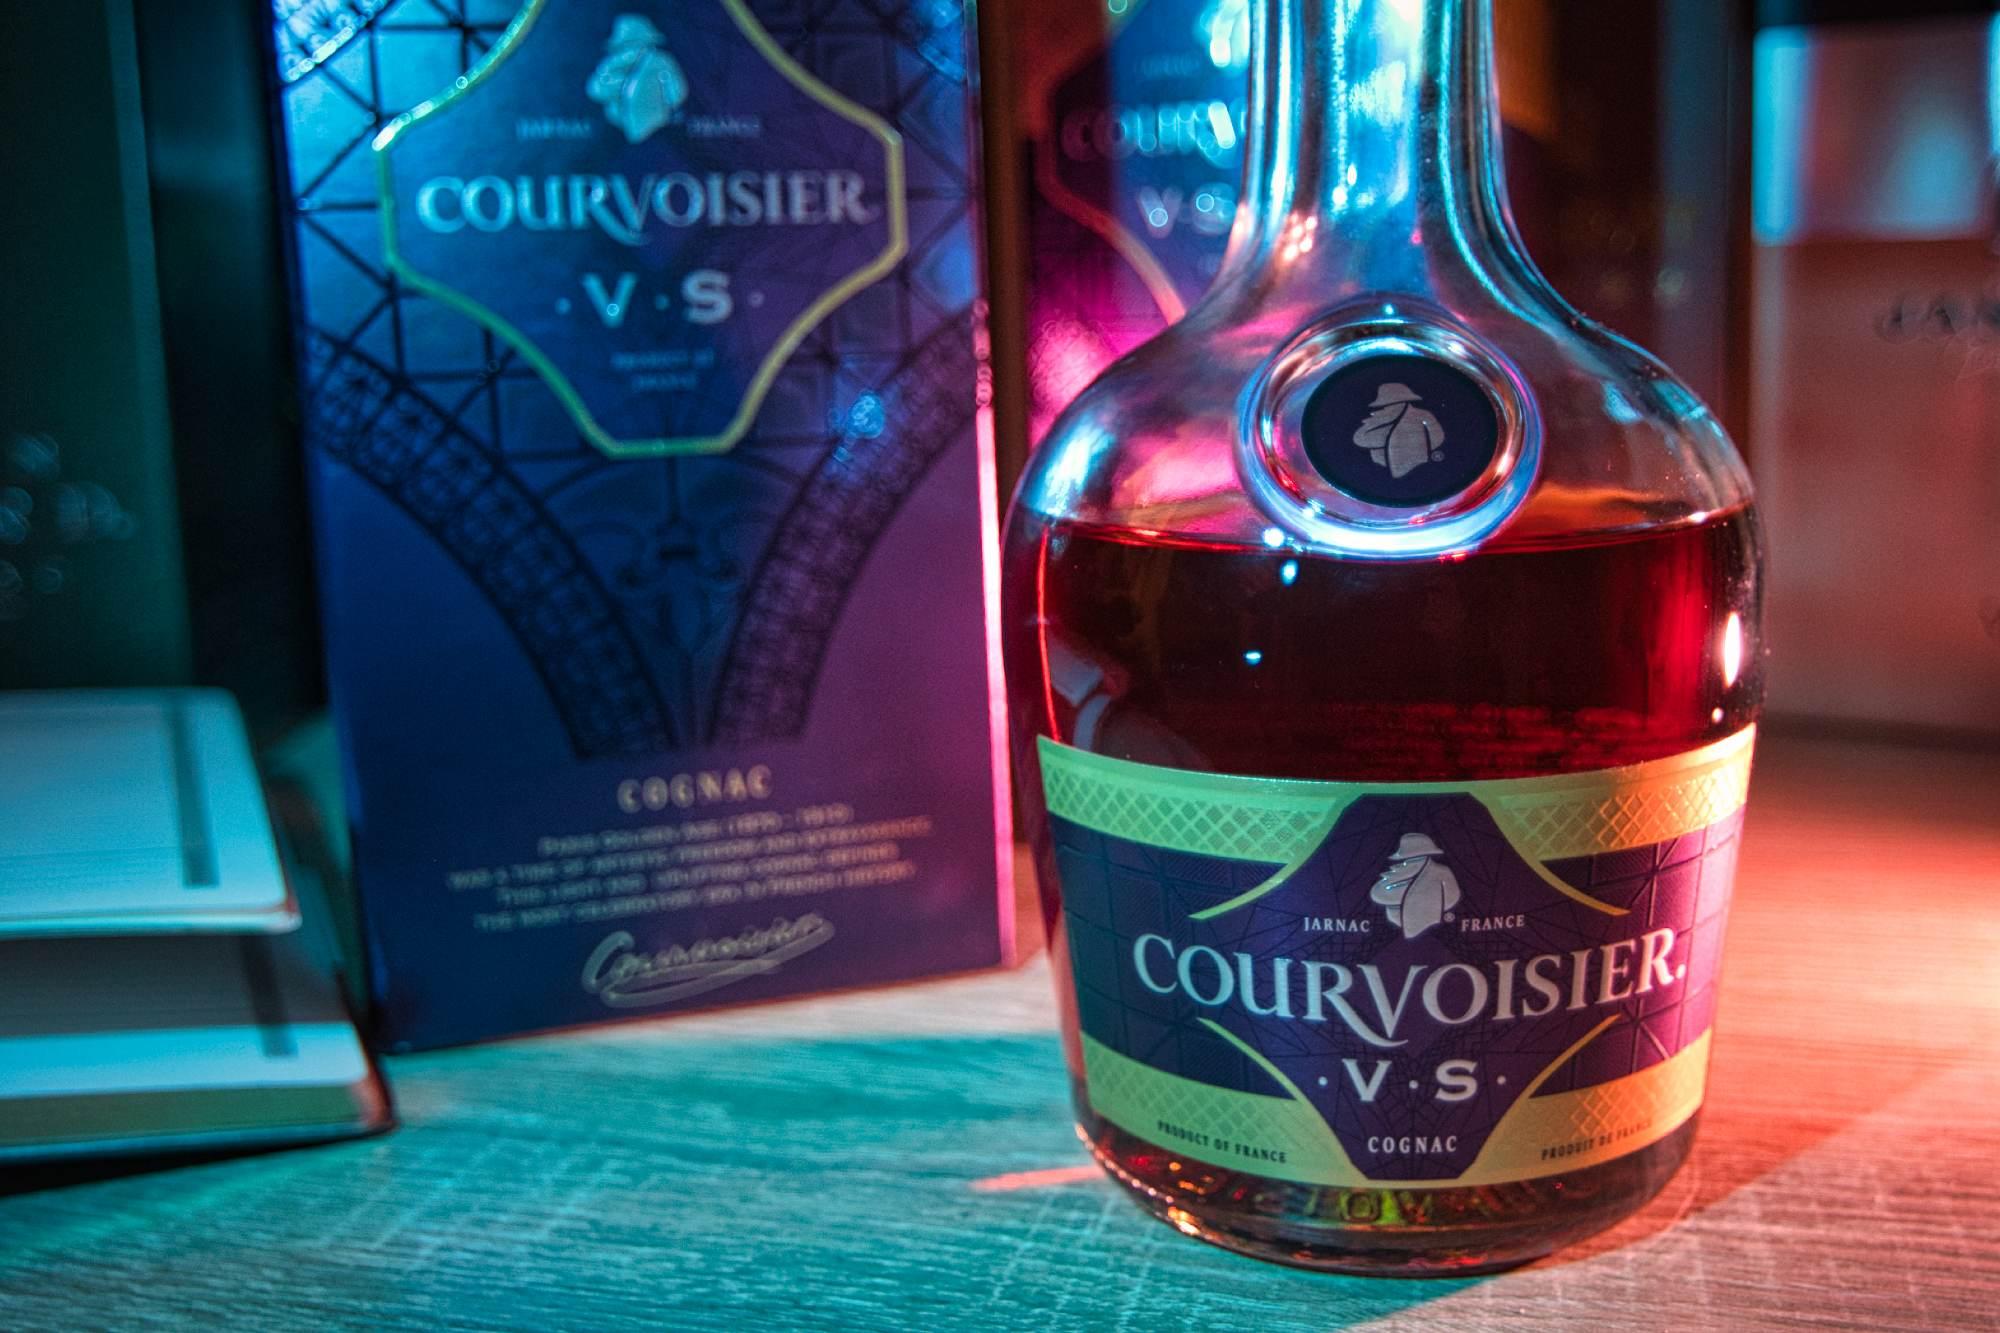 Courvoisier Cognac VS - Very Special - Review